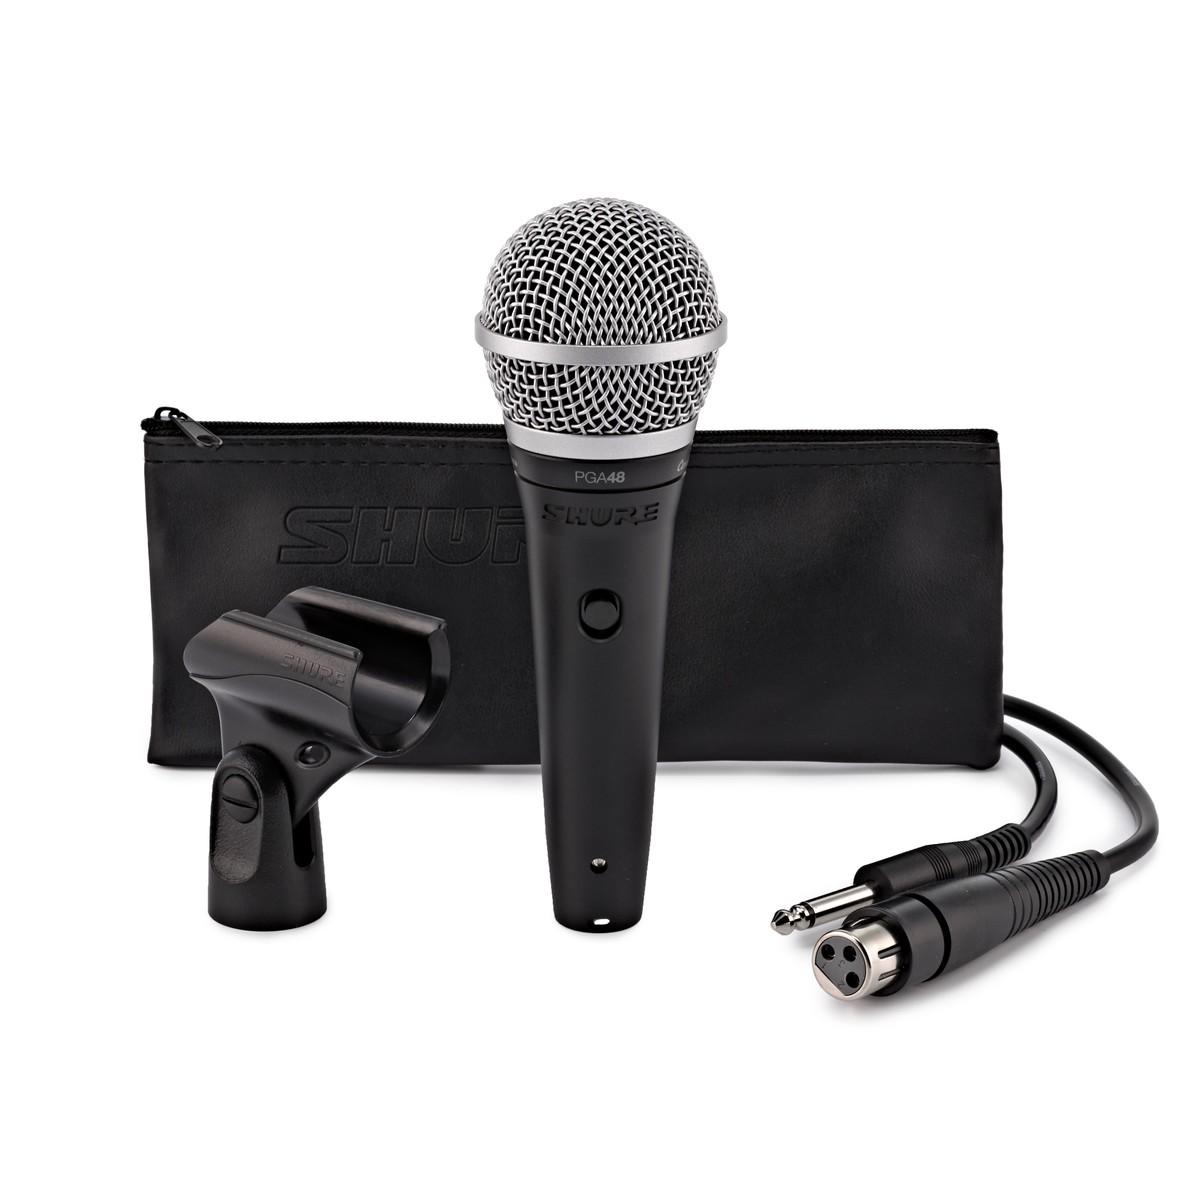 Se TILBUD på Dynamisk Mikrofon god til DJ og sang, inkl